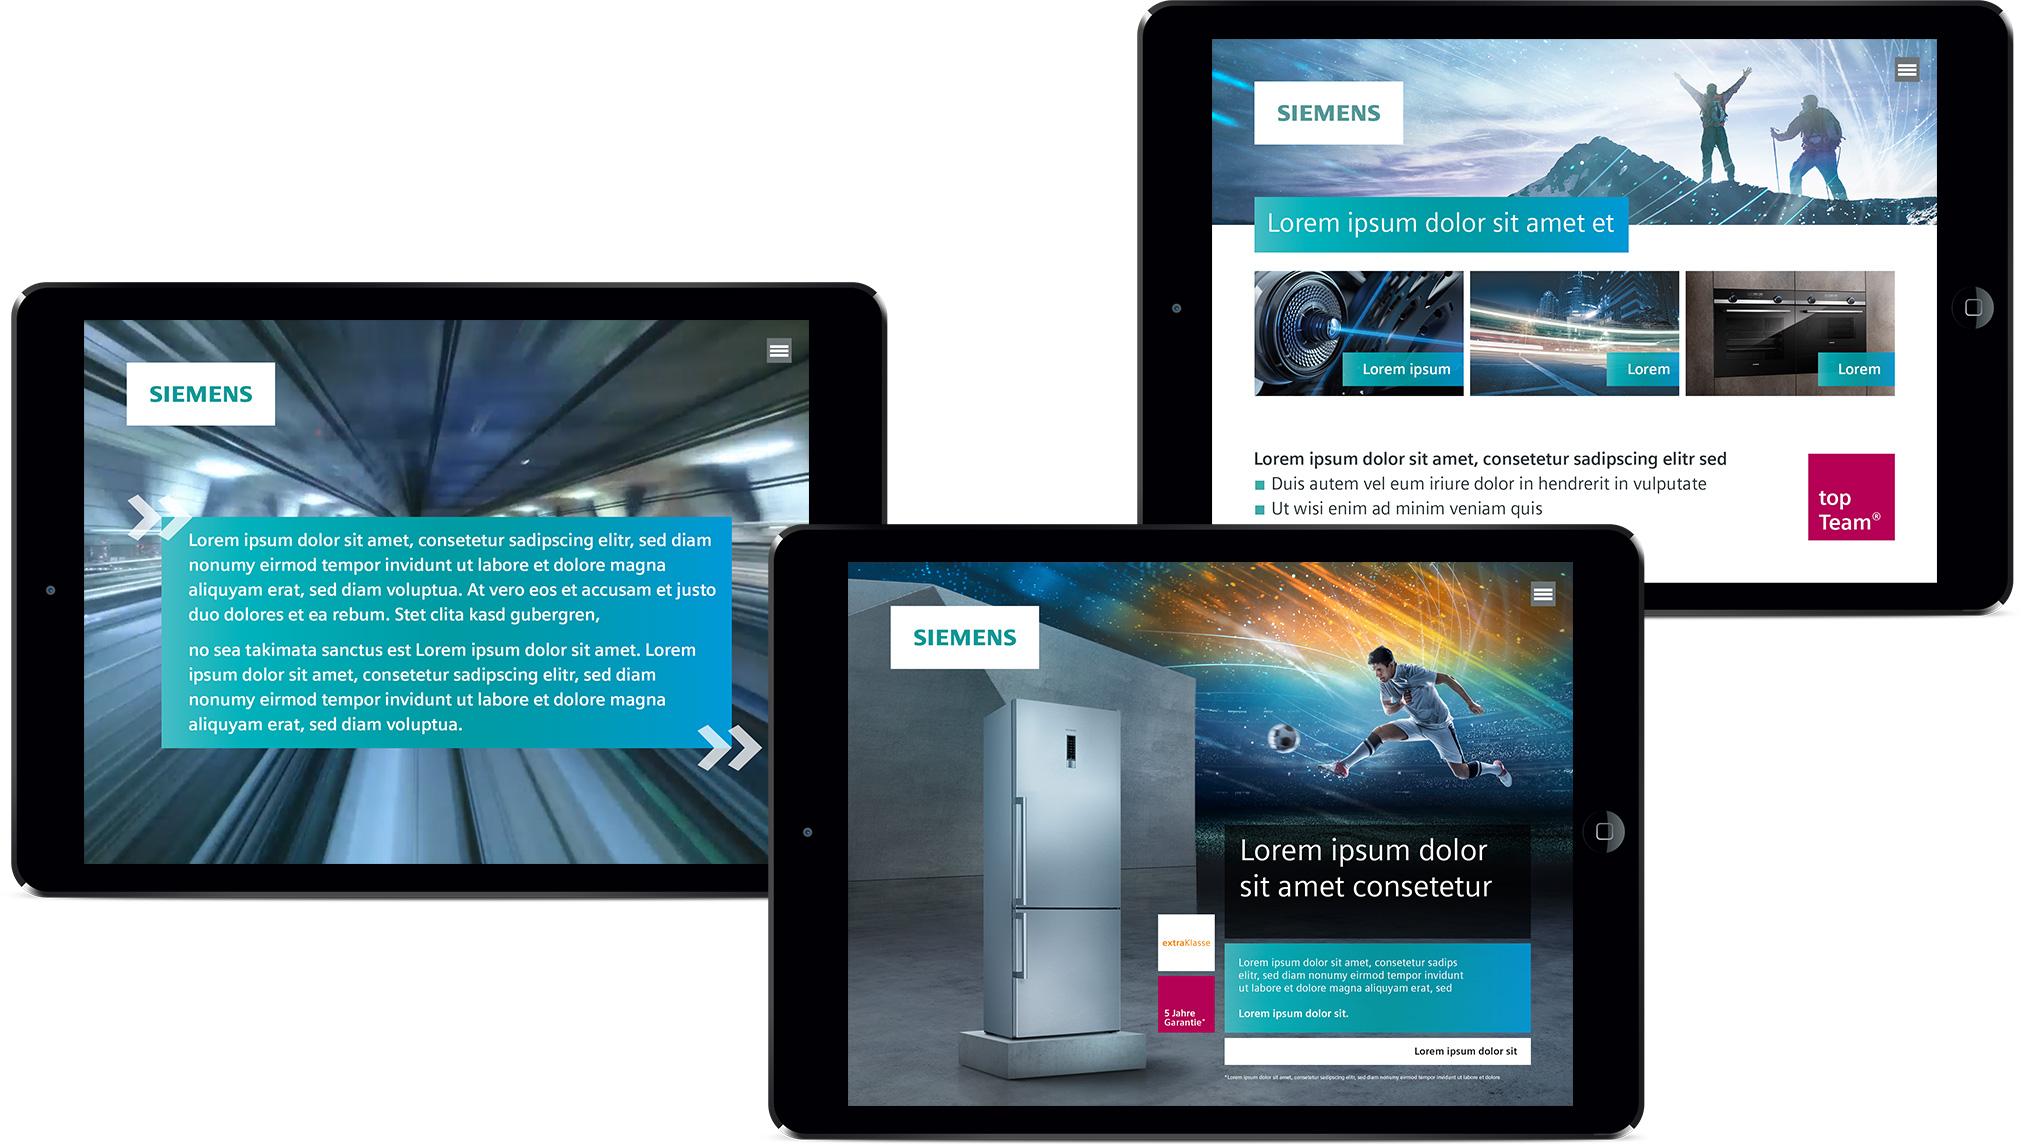 topTeam App in iPads